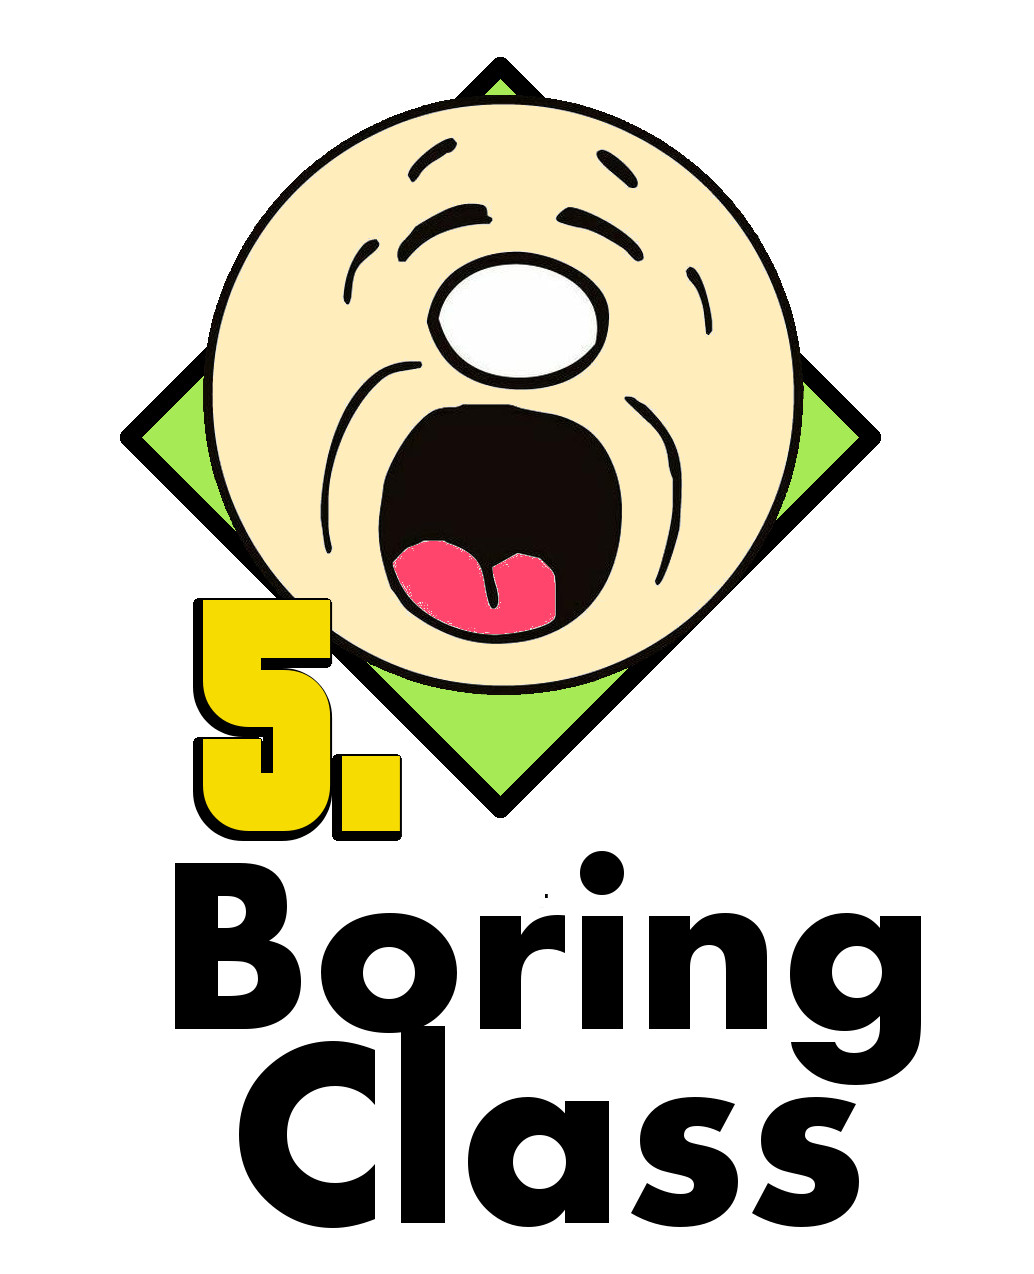 boring class telegram